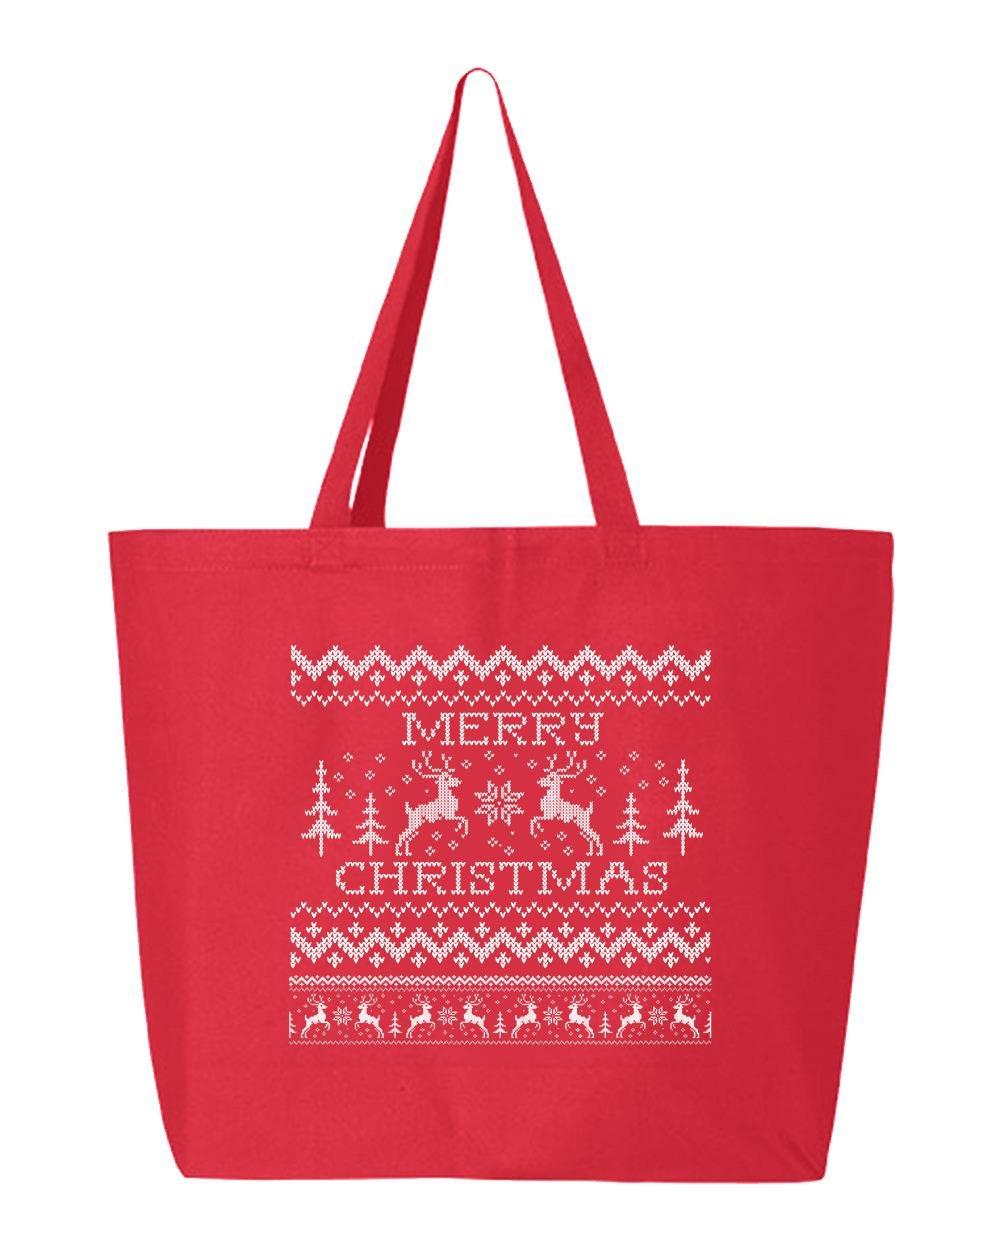 shop4ever Merry Christmas 2つトナカイHeavyキャンバストートバッグクロスステッチ再利用可能なショッピングバッグ10オンスジャンボ 25 oz レッド S4E_1215_ChristRind2_TB_Q600_Red_1 B072NZXBHN レッド 1 レッド